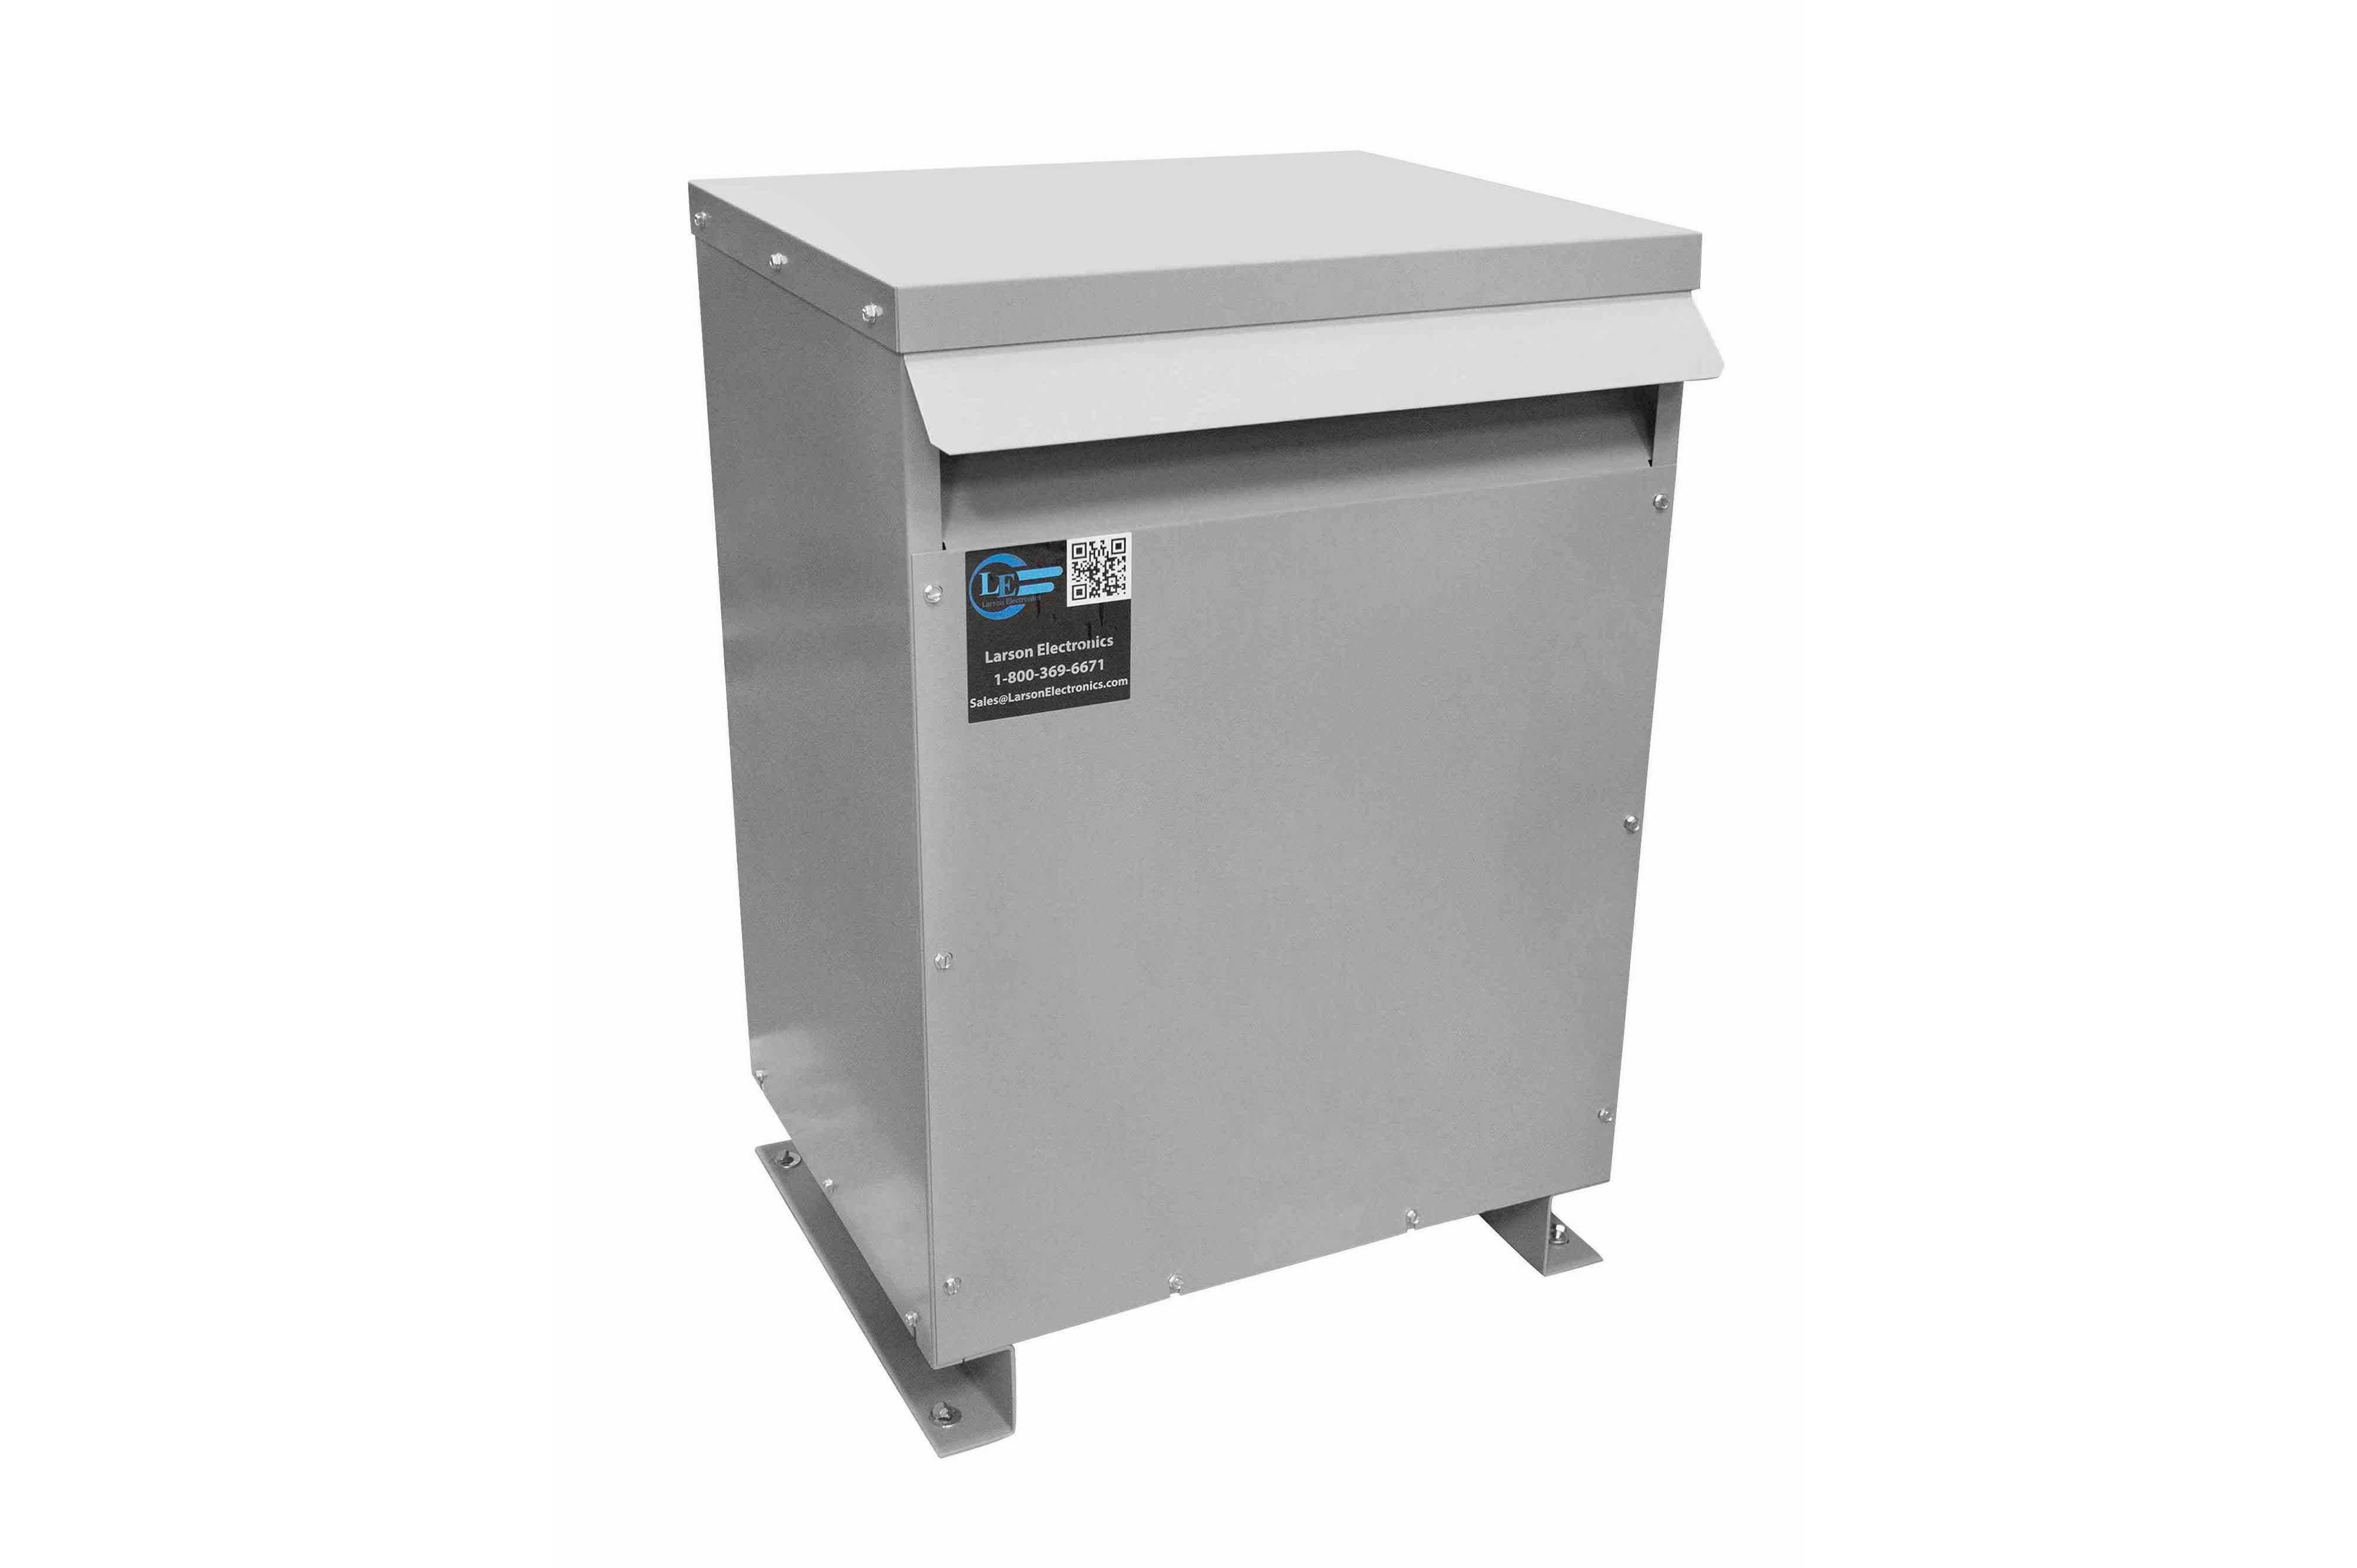 32.5 kVA 3PH Isolation Transformer, 240V Wye Primary, 380Y/220 Wye-N Secondary, N3R, Ventilated, 60 Hz